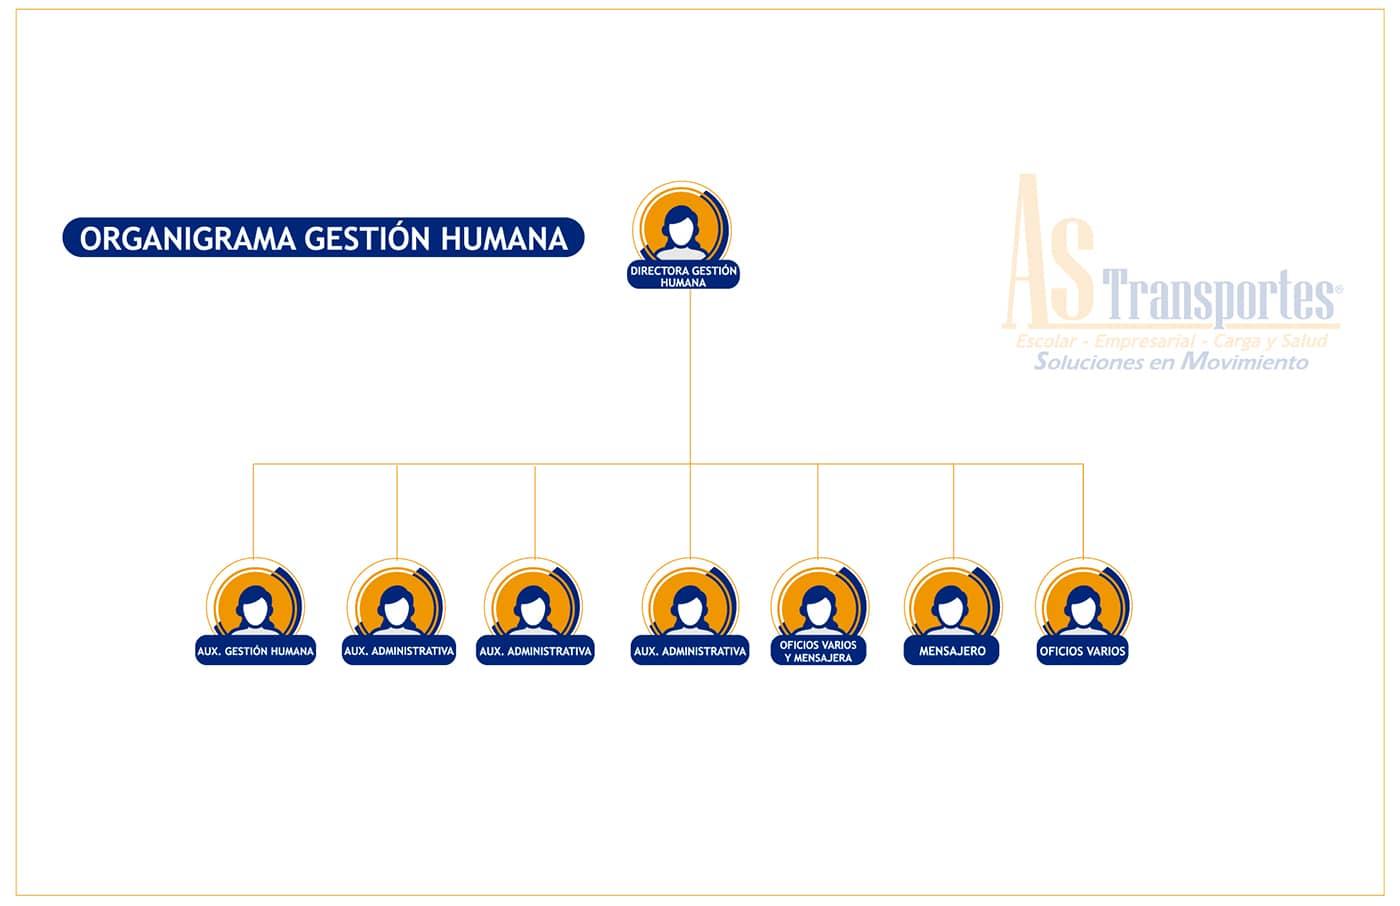 ORGANIGRAMA DE PAGINA WEB GESTION HUMANA